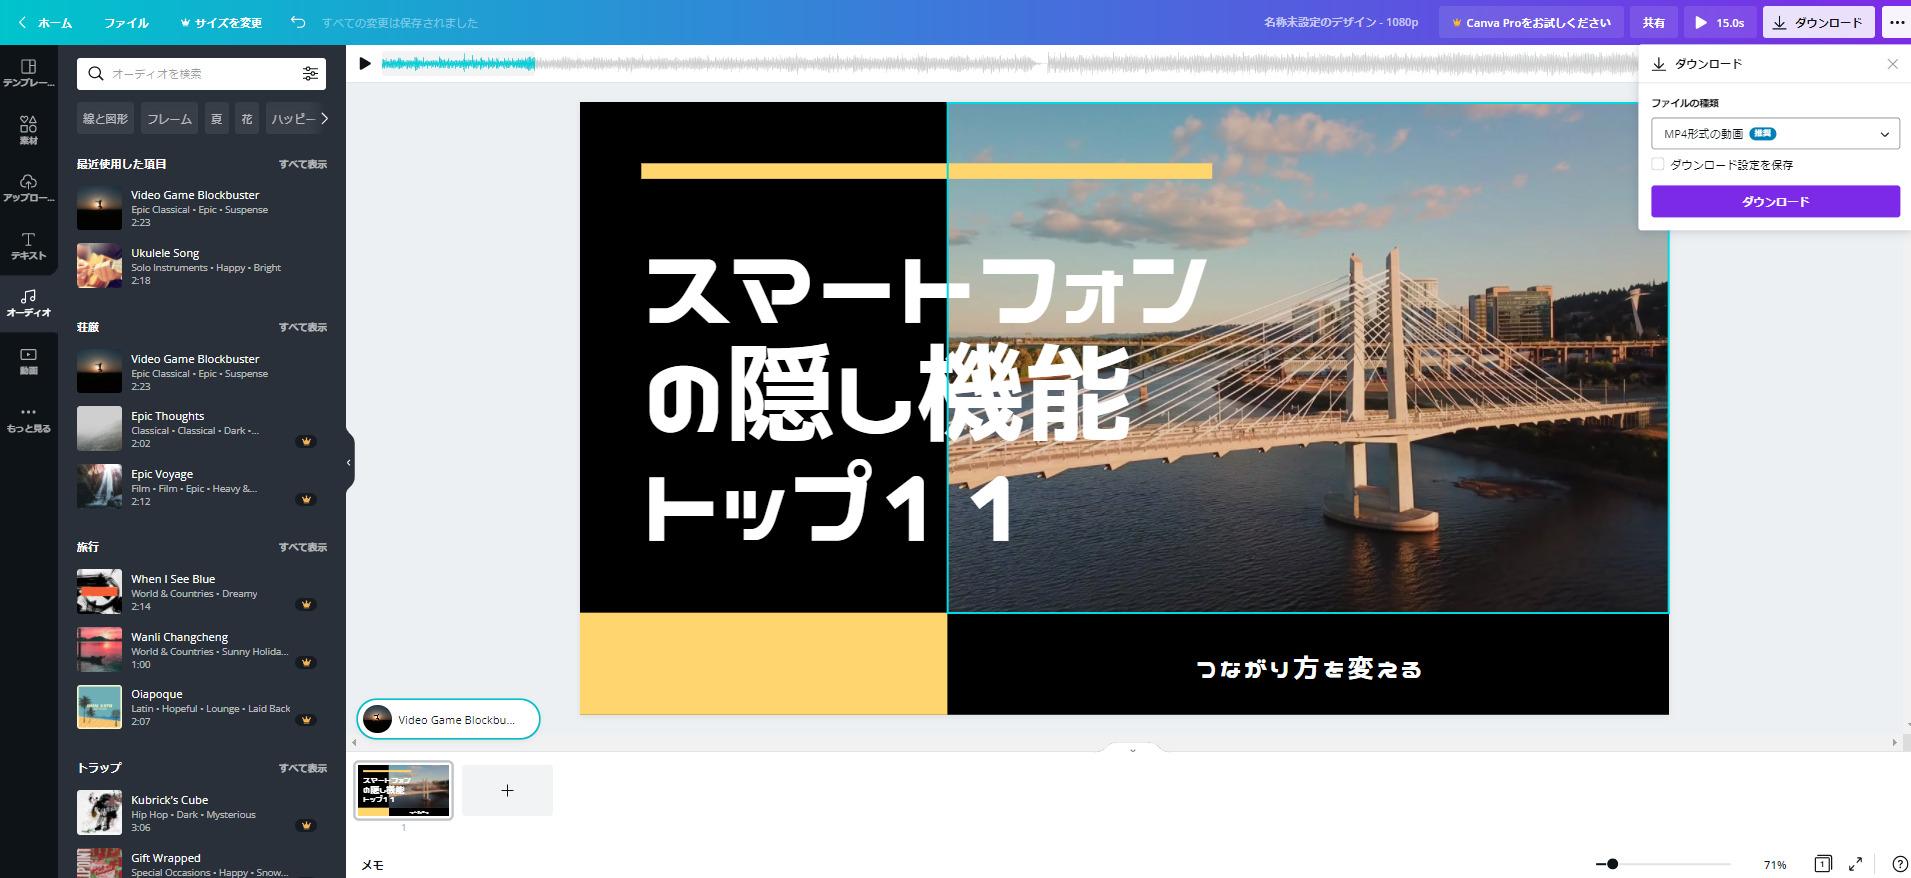 canvaでYOUTUBE用のイントロ動画を作る方法